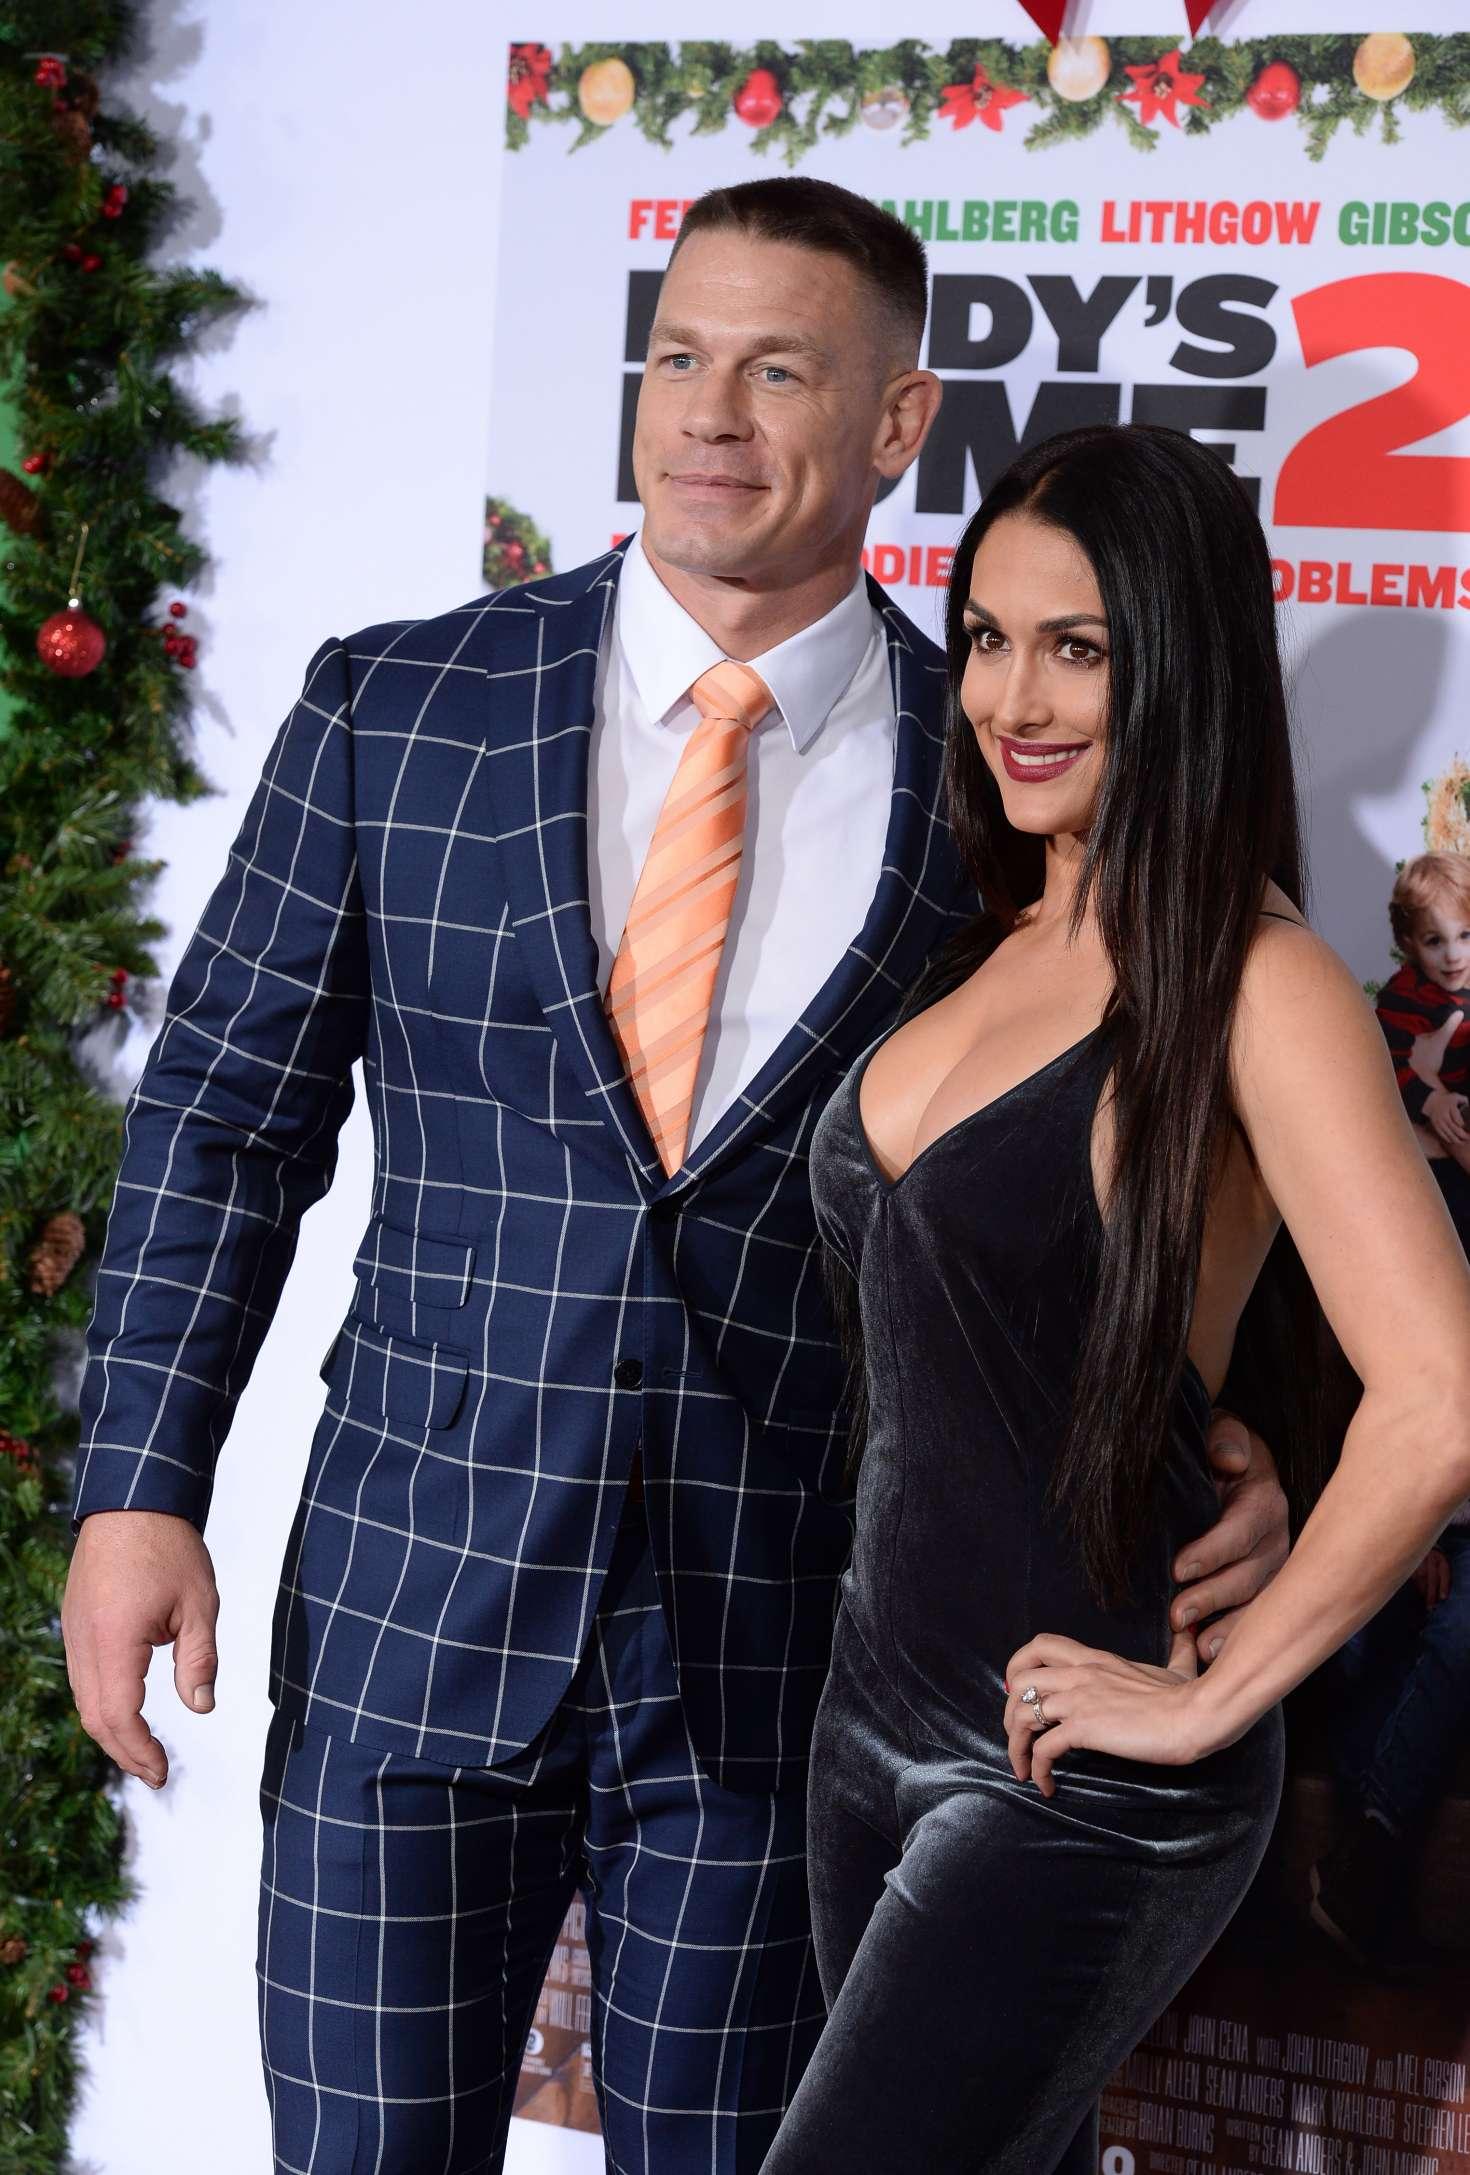 Nikki Bella and John Cena: Daddys Home 2 Premiere -35 - GotCeleb